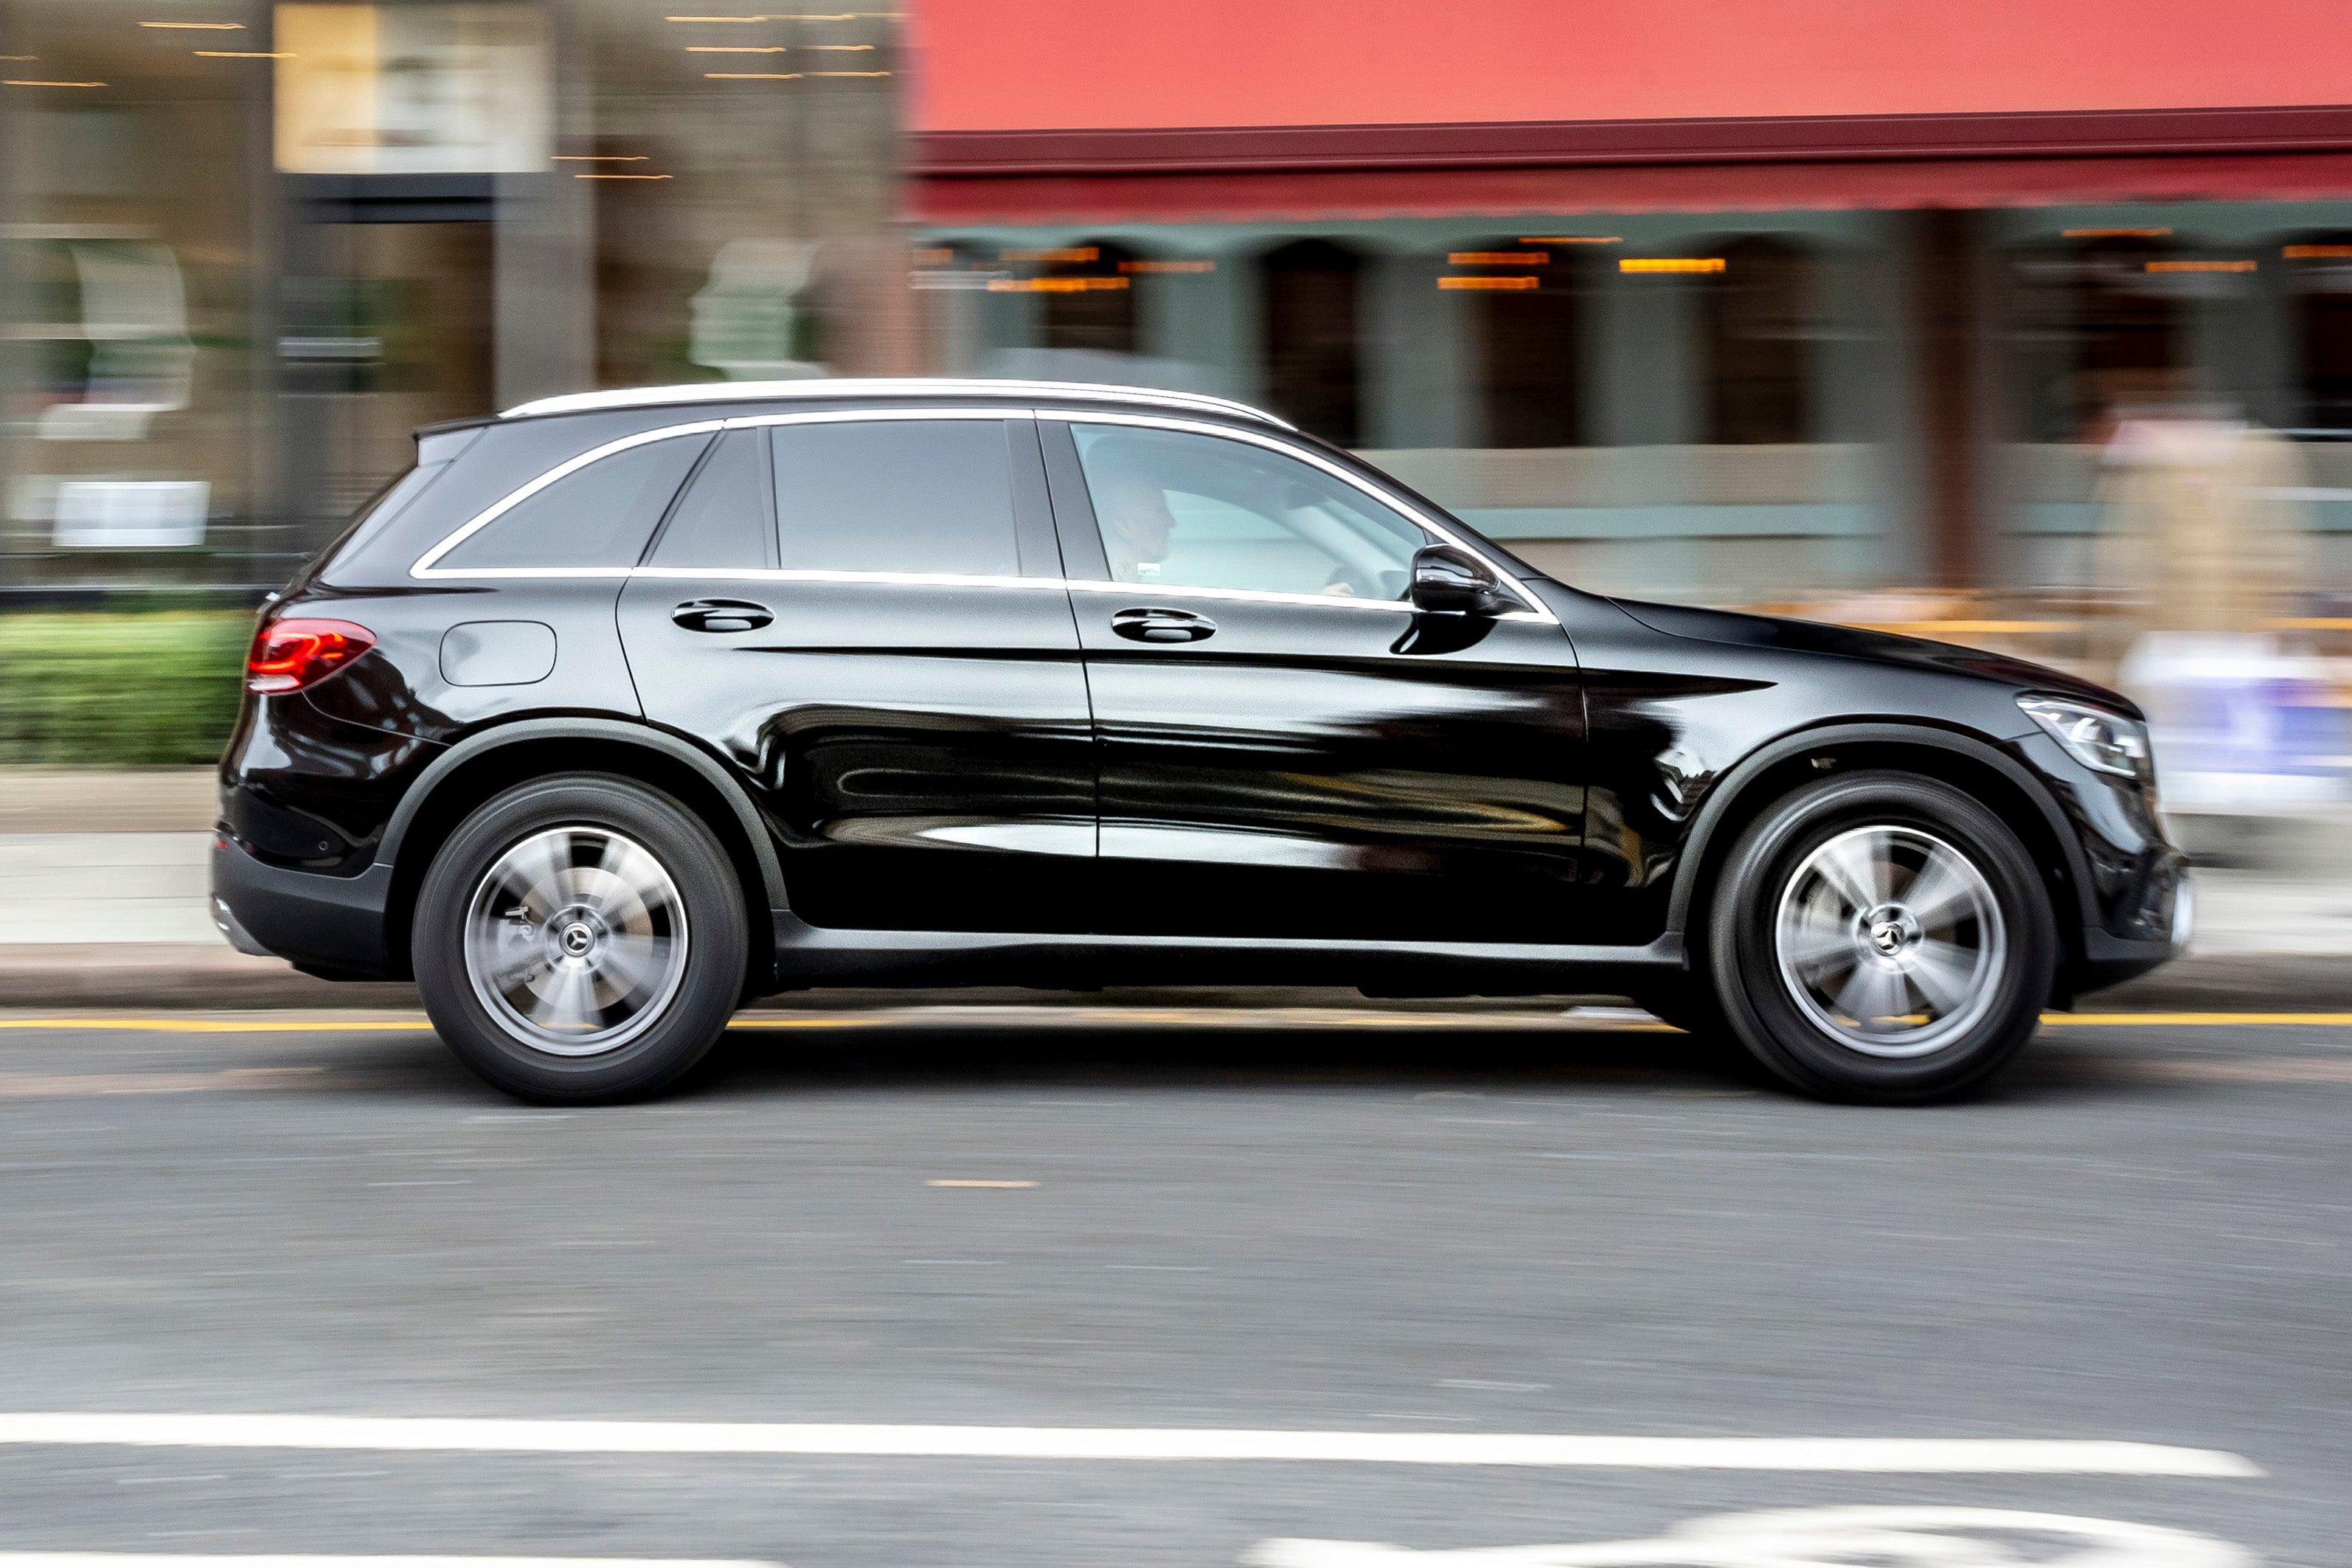 Mercedes GLC rightside exterior